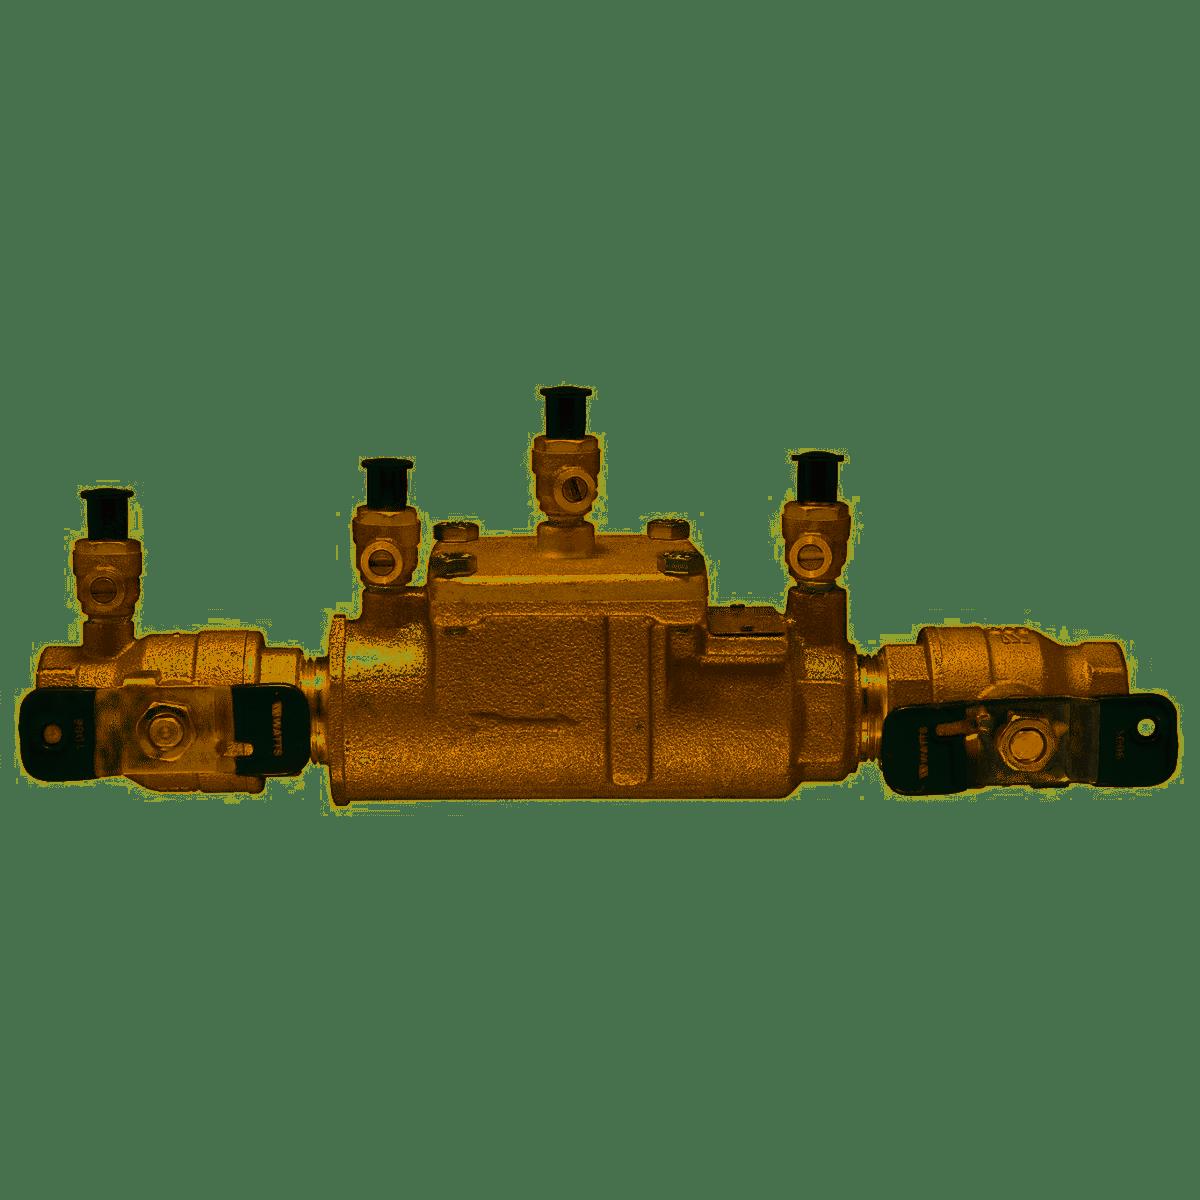 0063235 WATTS 2inch LF007M1-QT DOUBLE CHECK VALVE